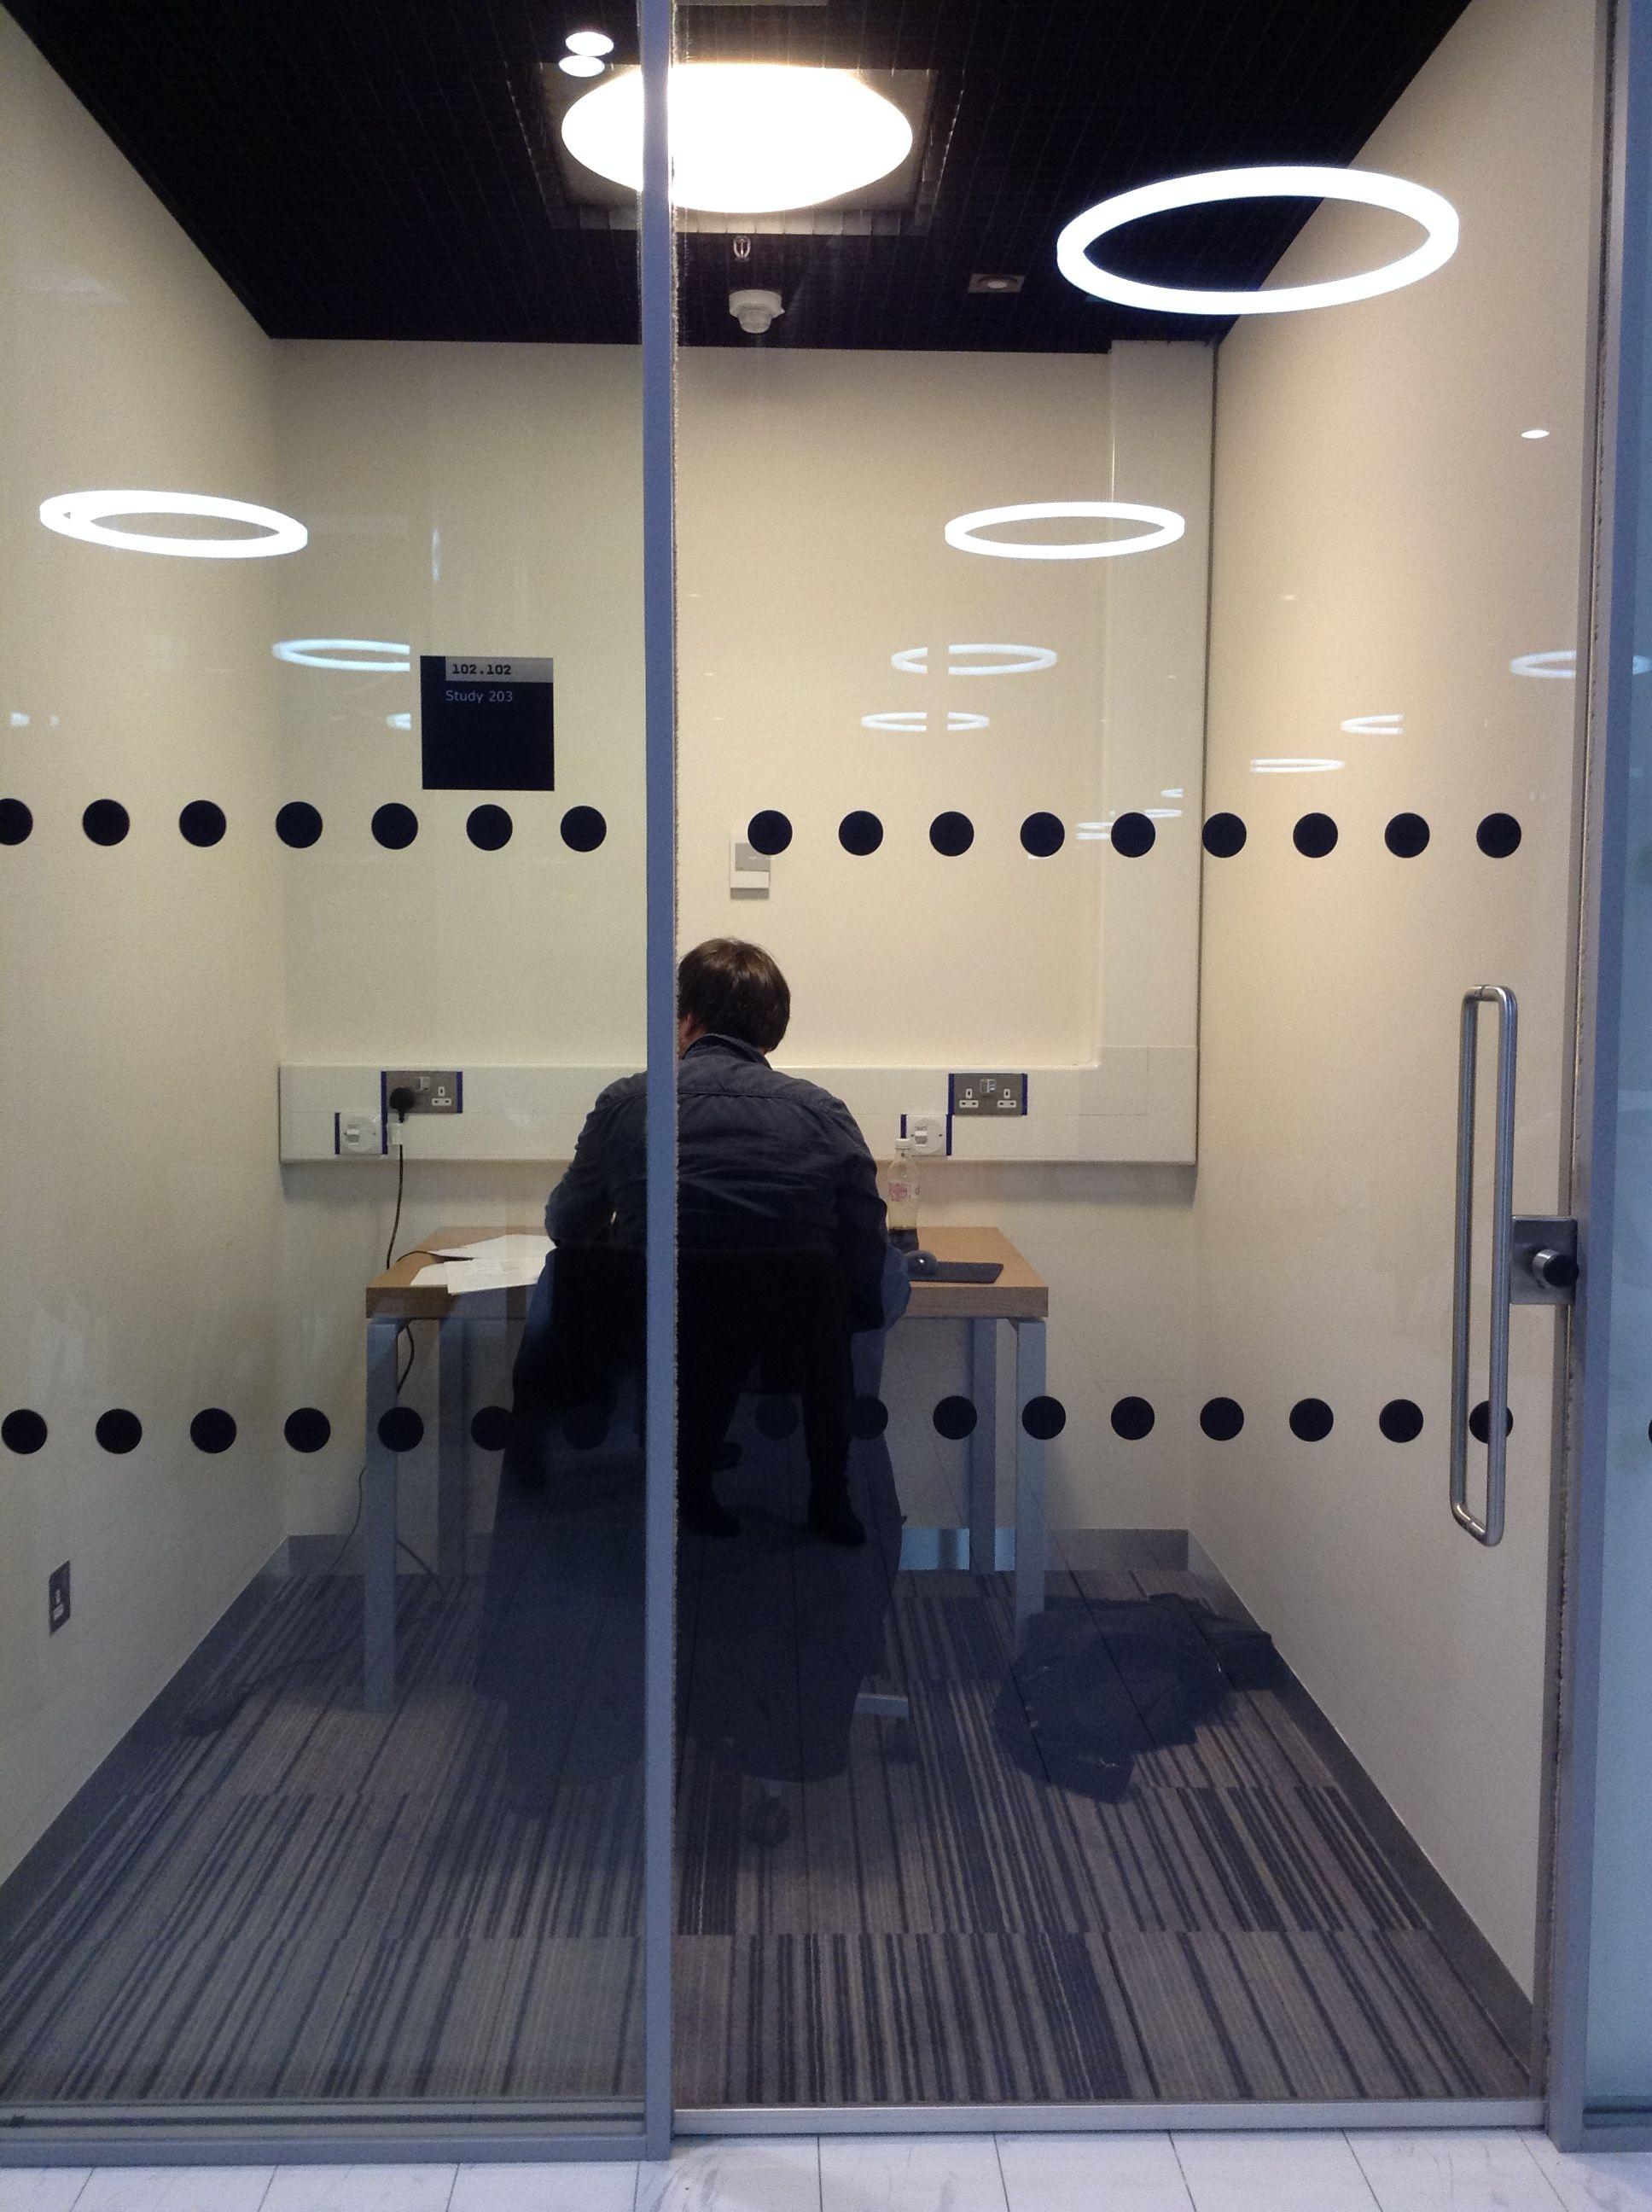 Study Room Glass: Audio/film? Individual Study? Training Room